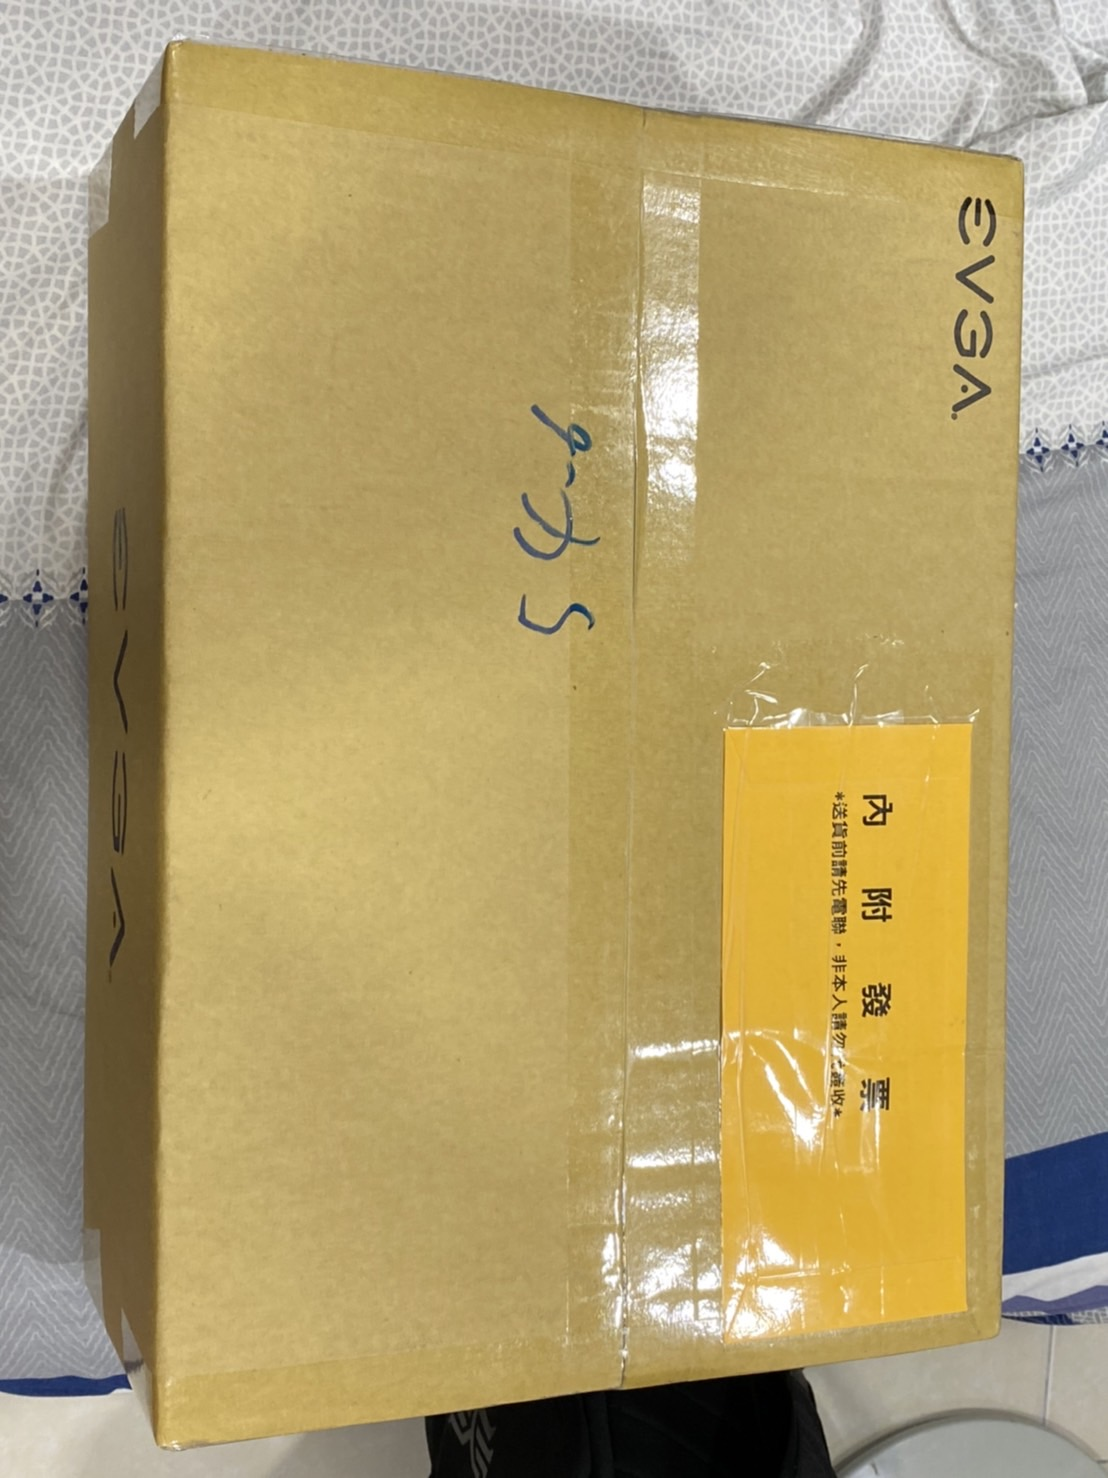 (售完)EVGA GeForce RTX 3080 FTW3 ULTRA GAMING 購買日期:9/16